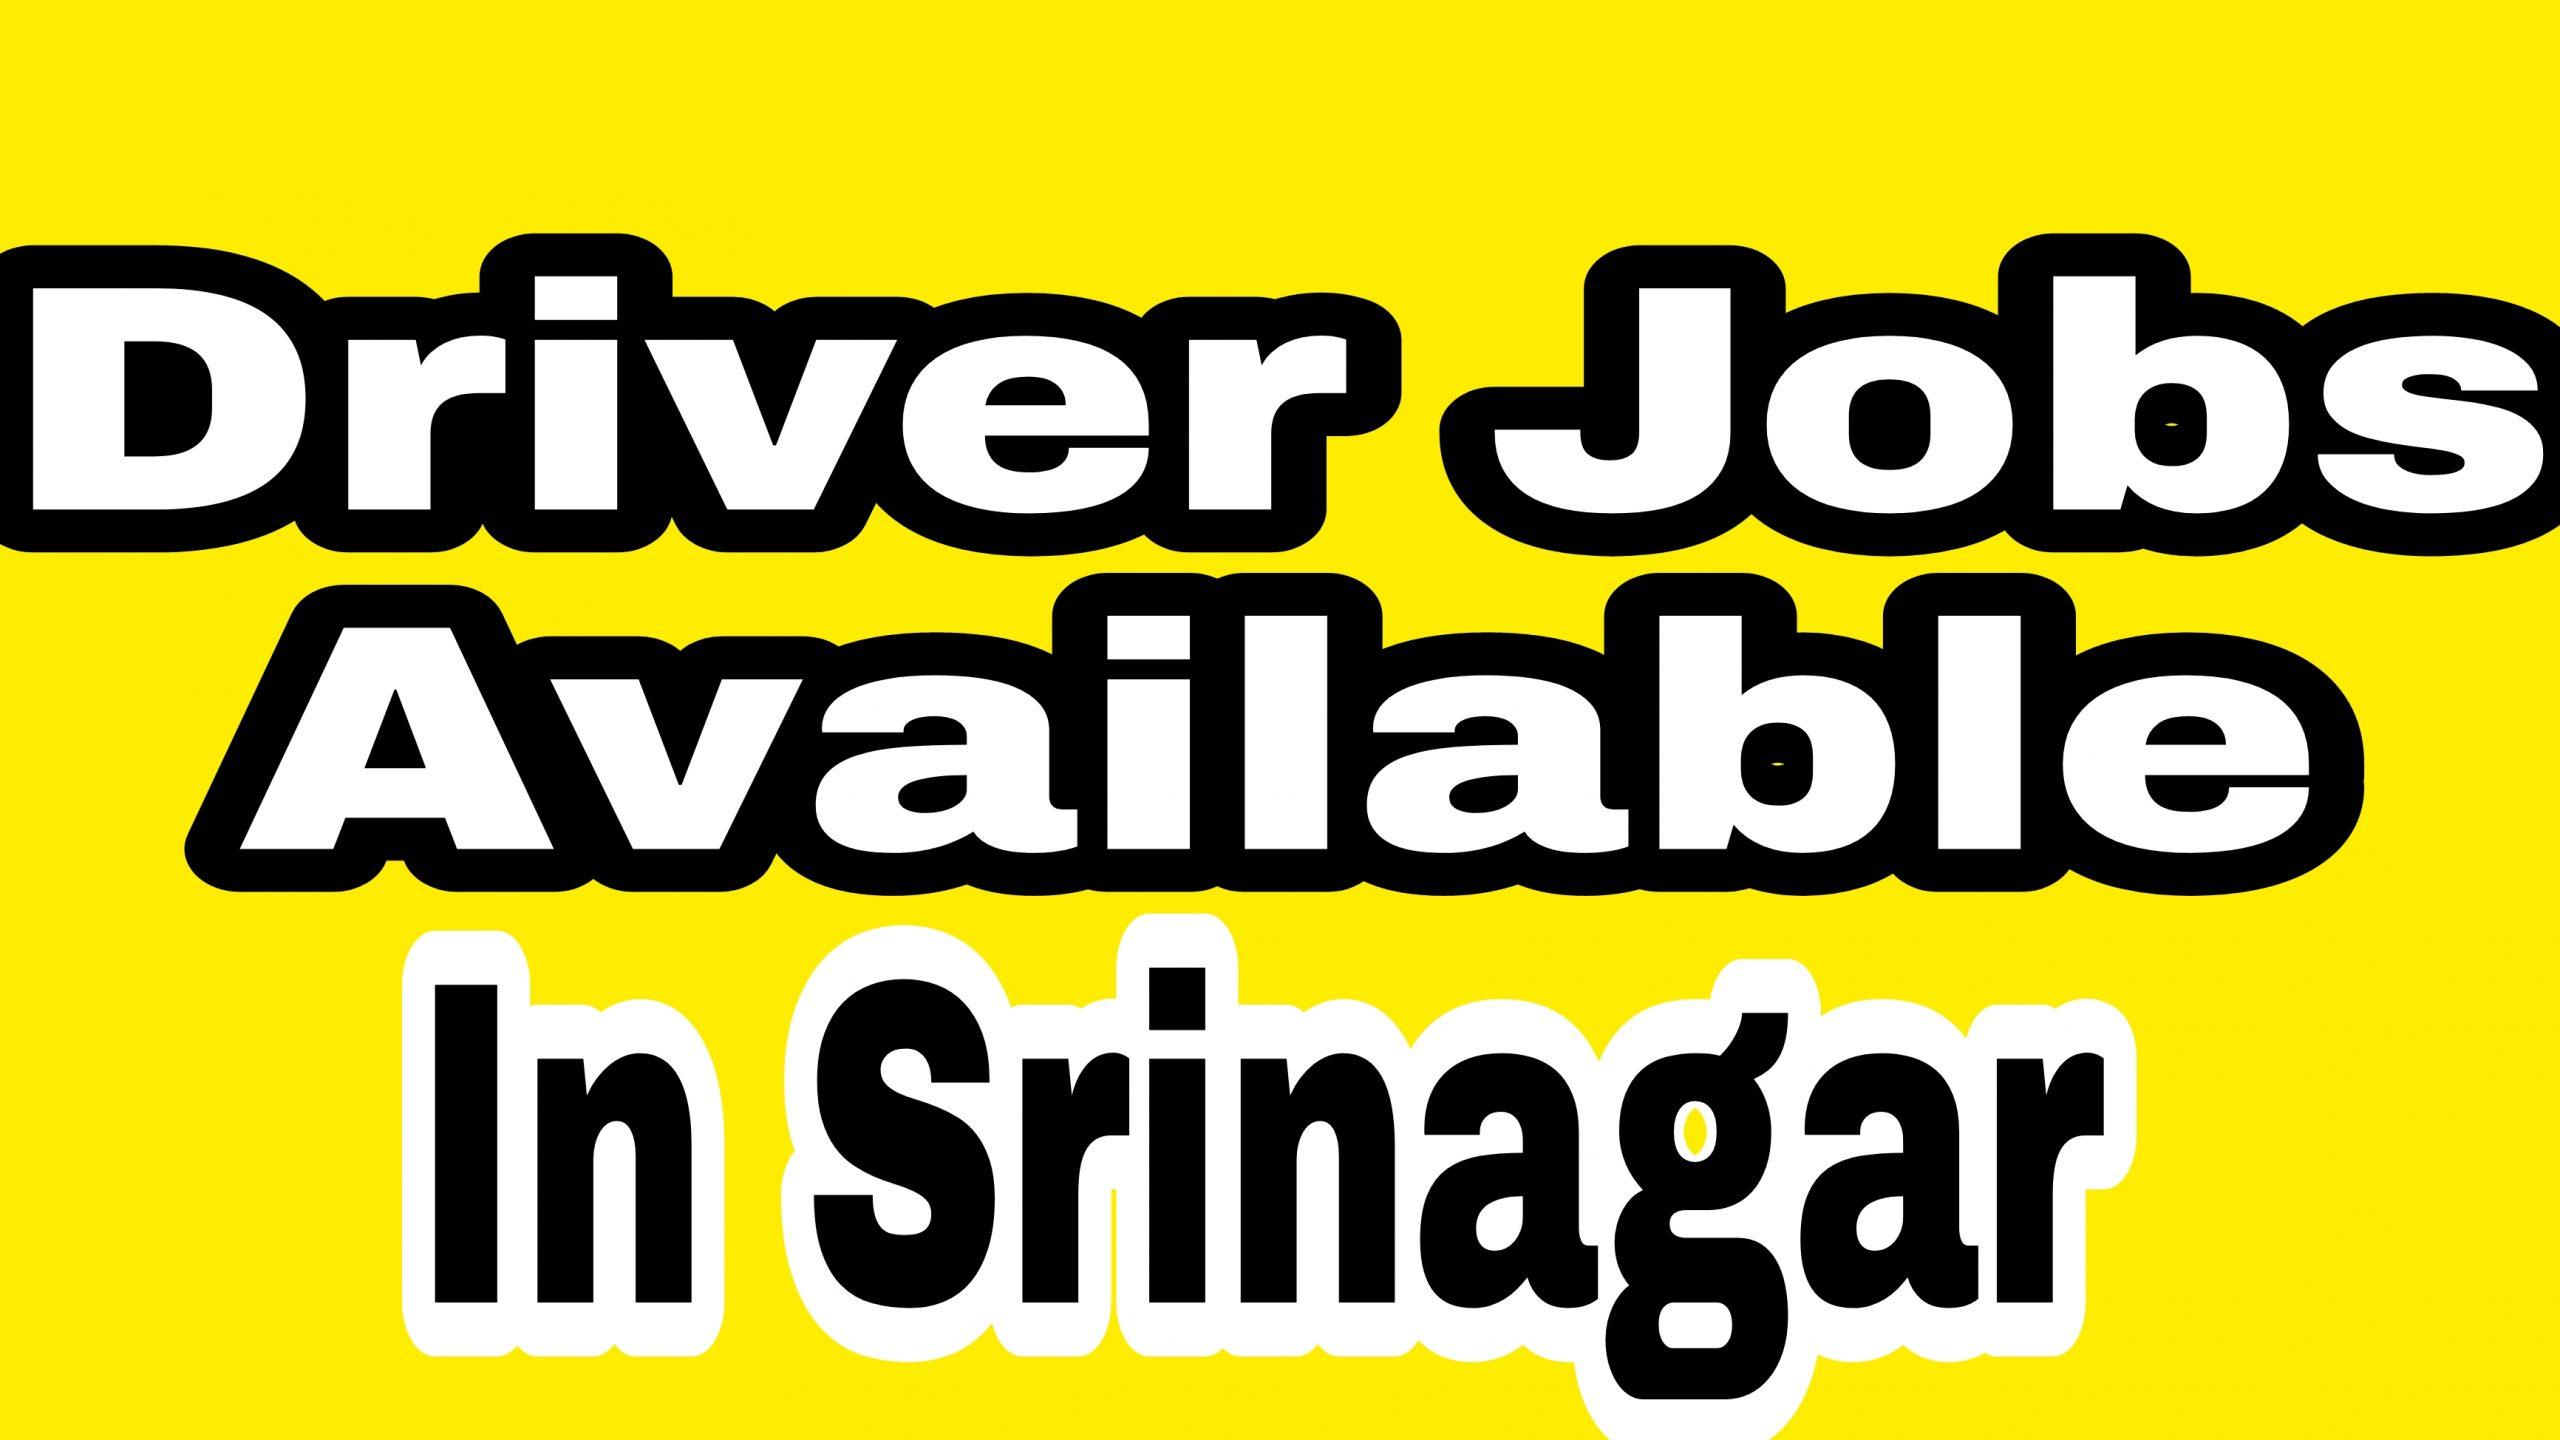 Driver jobs Srinagar Bemina Qamarwari HMT